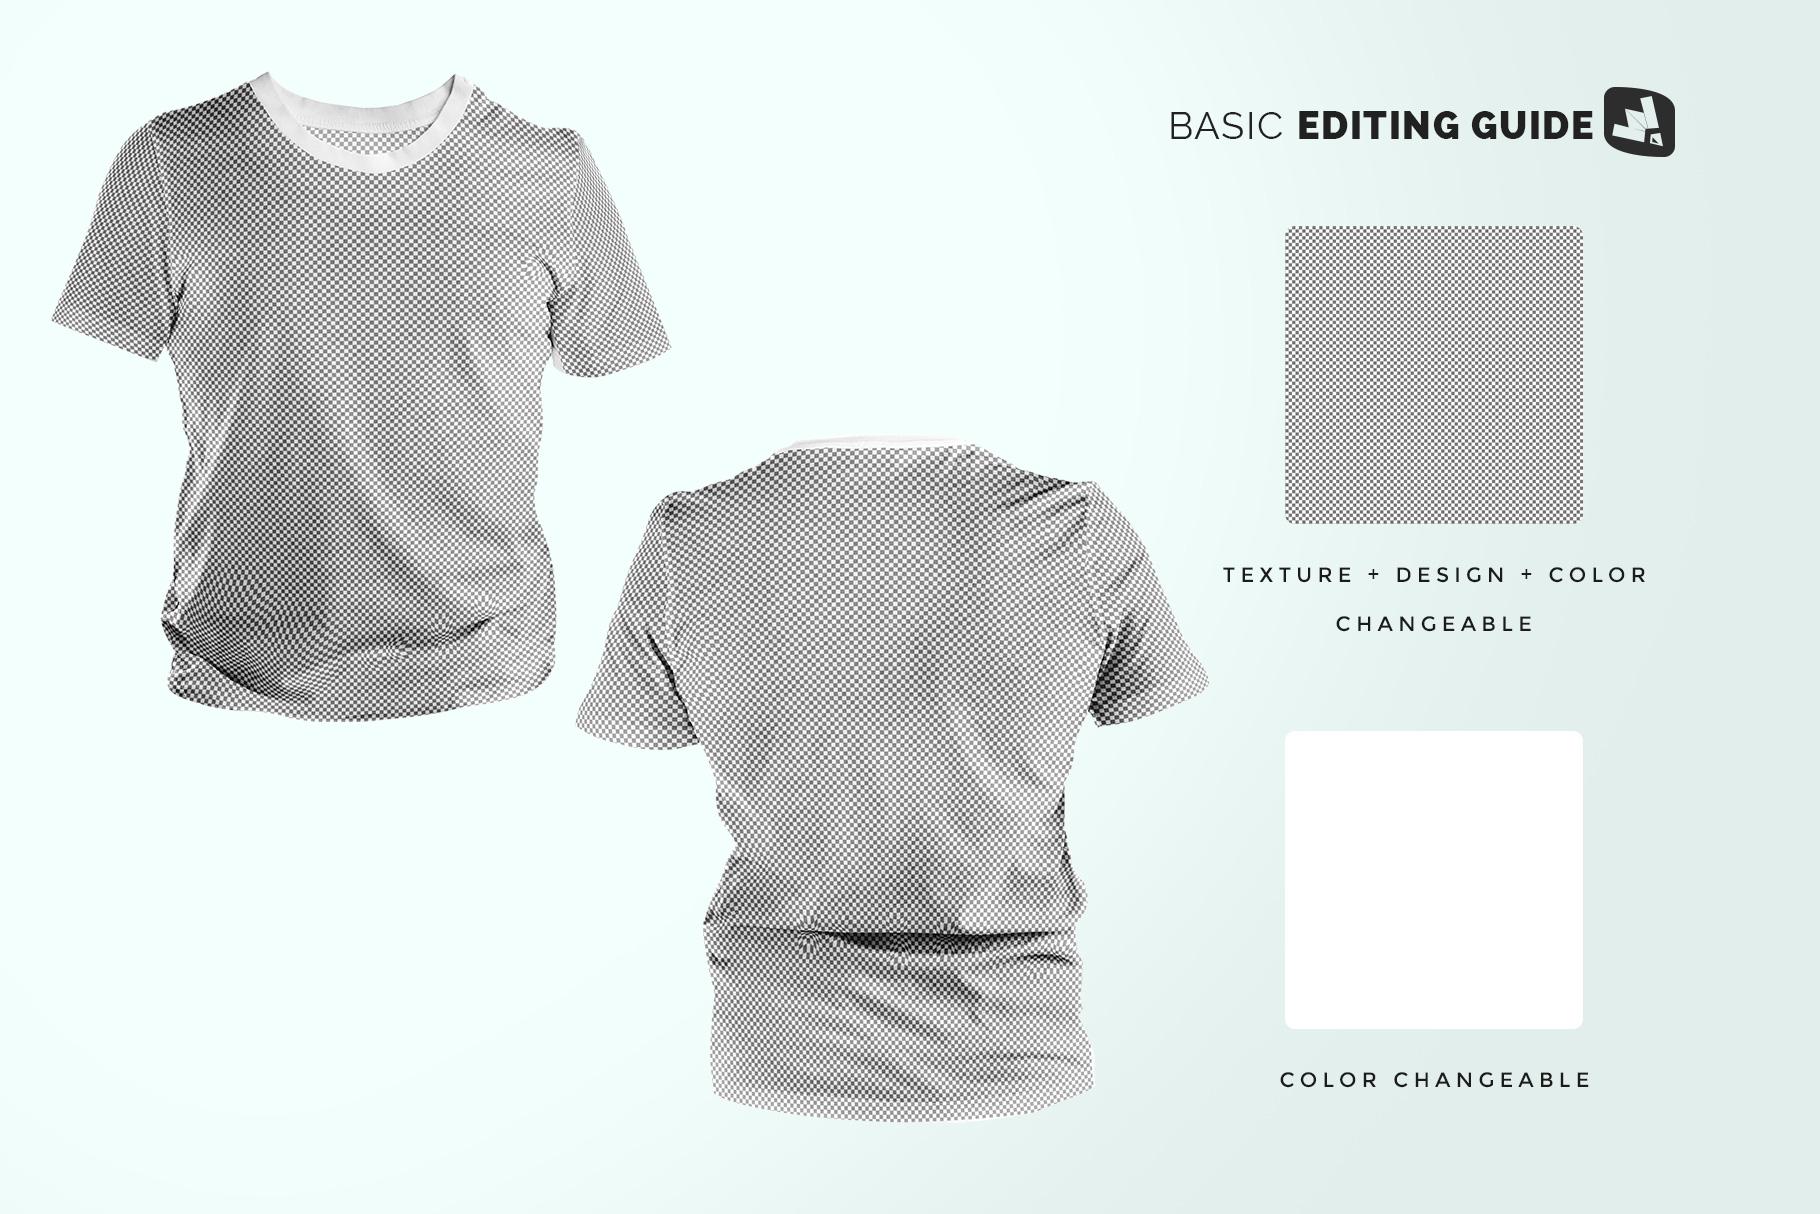 editability of the men's round collar tshirt mockup